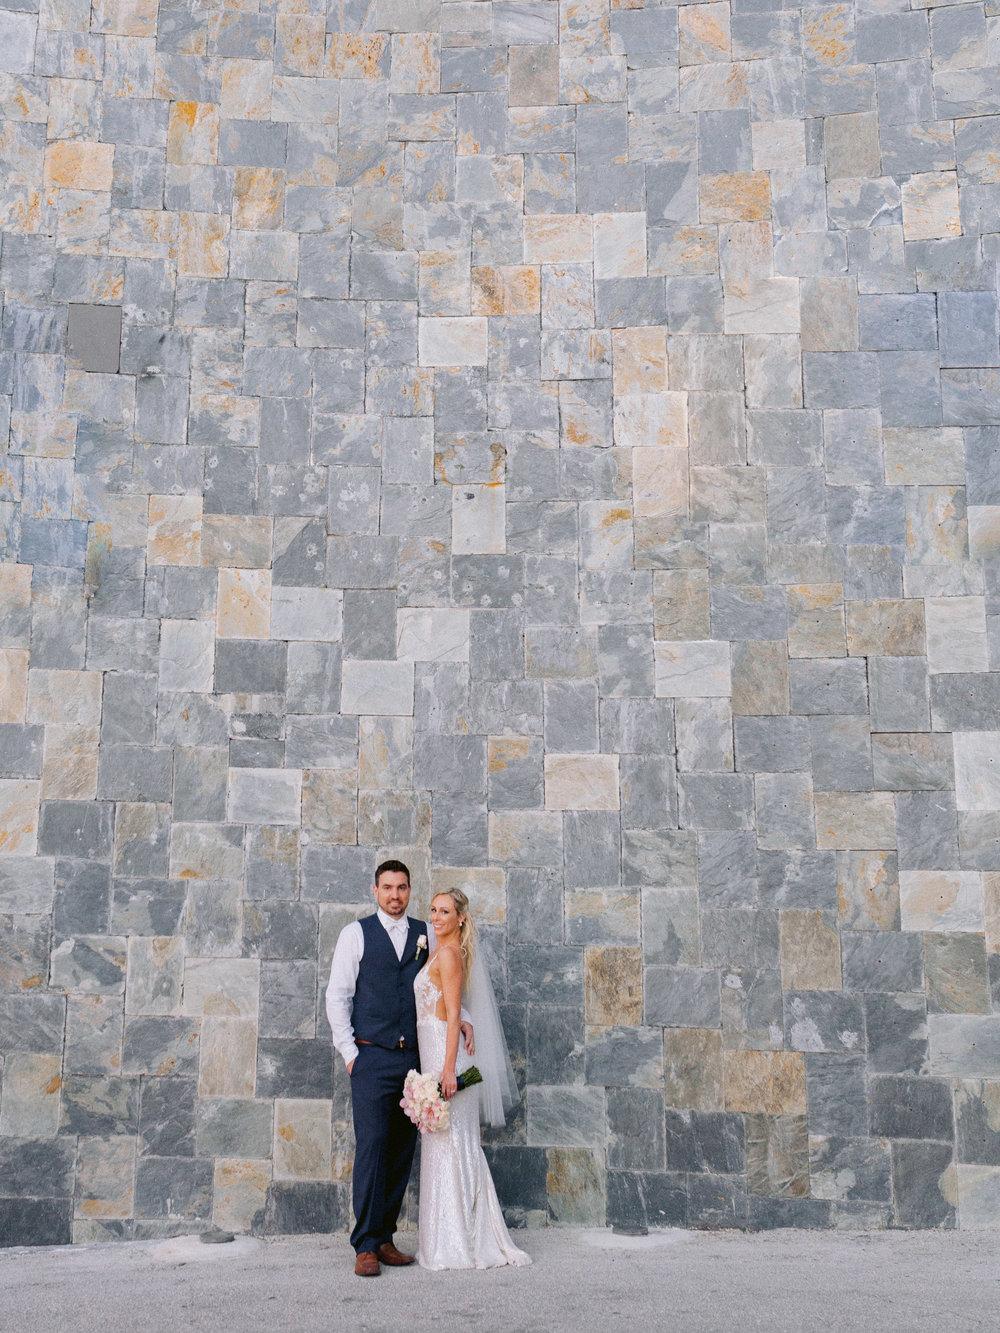 Kim_Jeff_Cancun Wedding_Portraits_Kurtz_Orpia (173 of 178).jpg